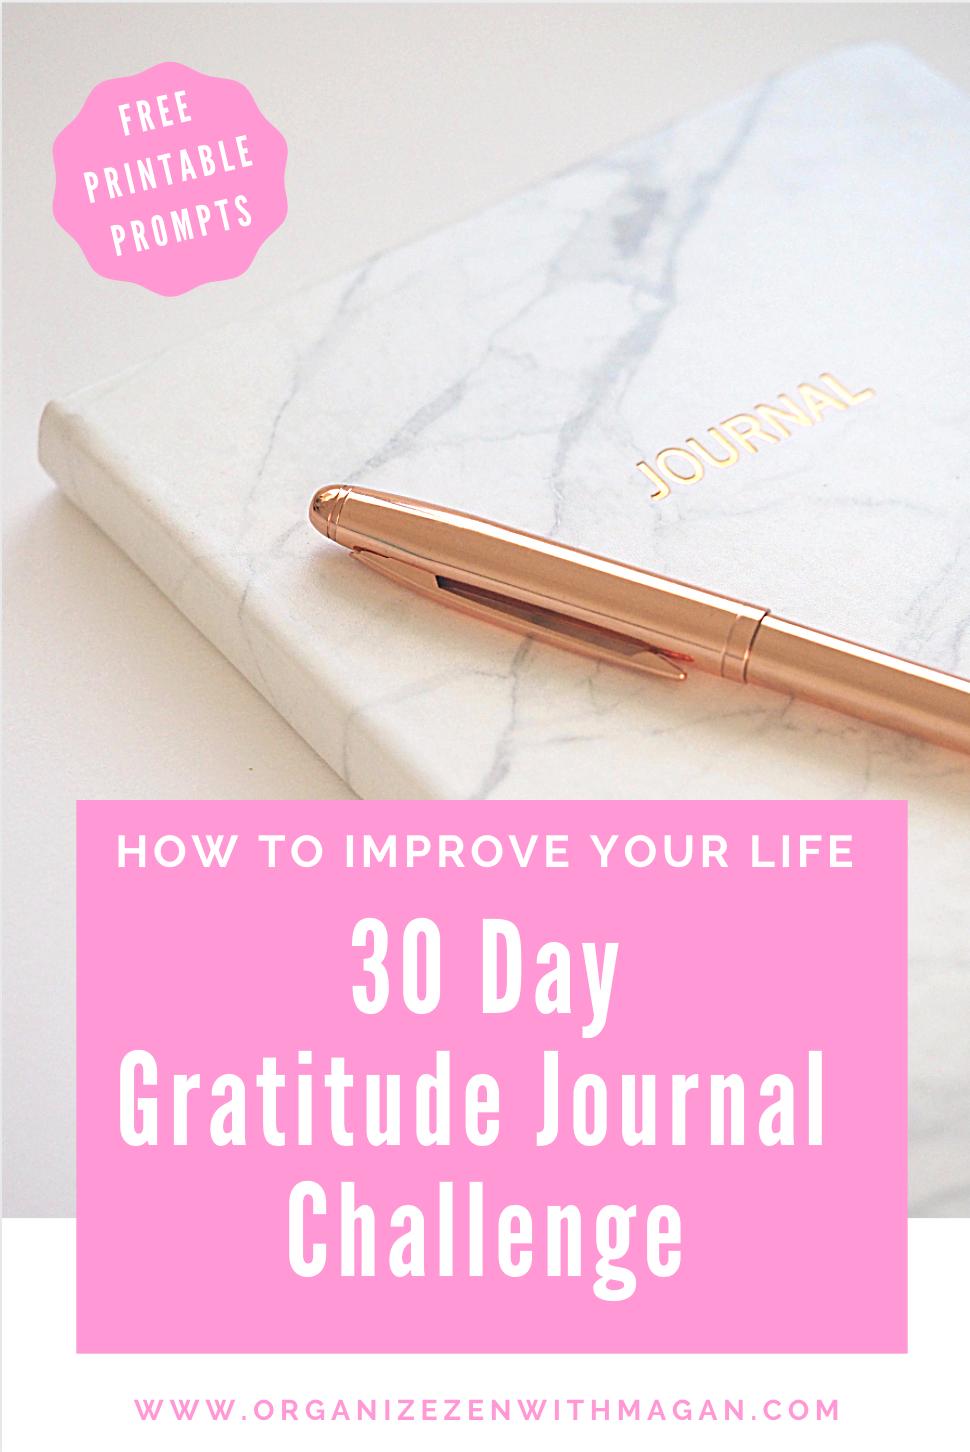 30 Day Gratitude Journal Challenge